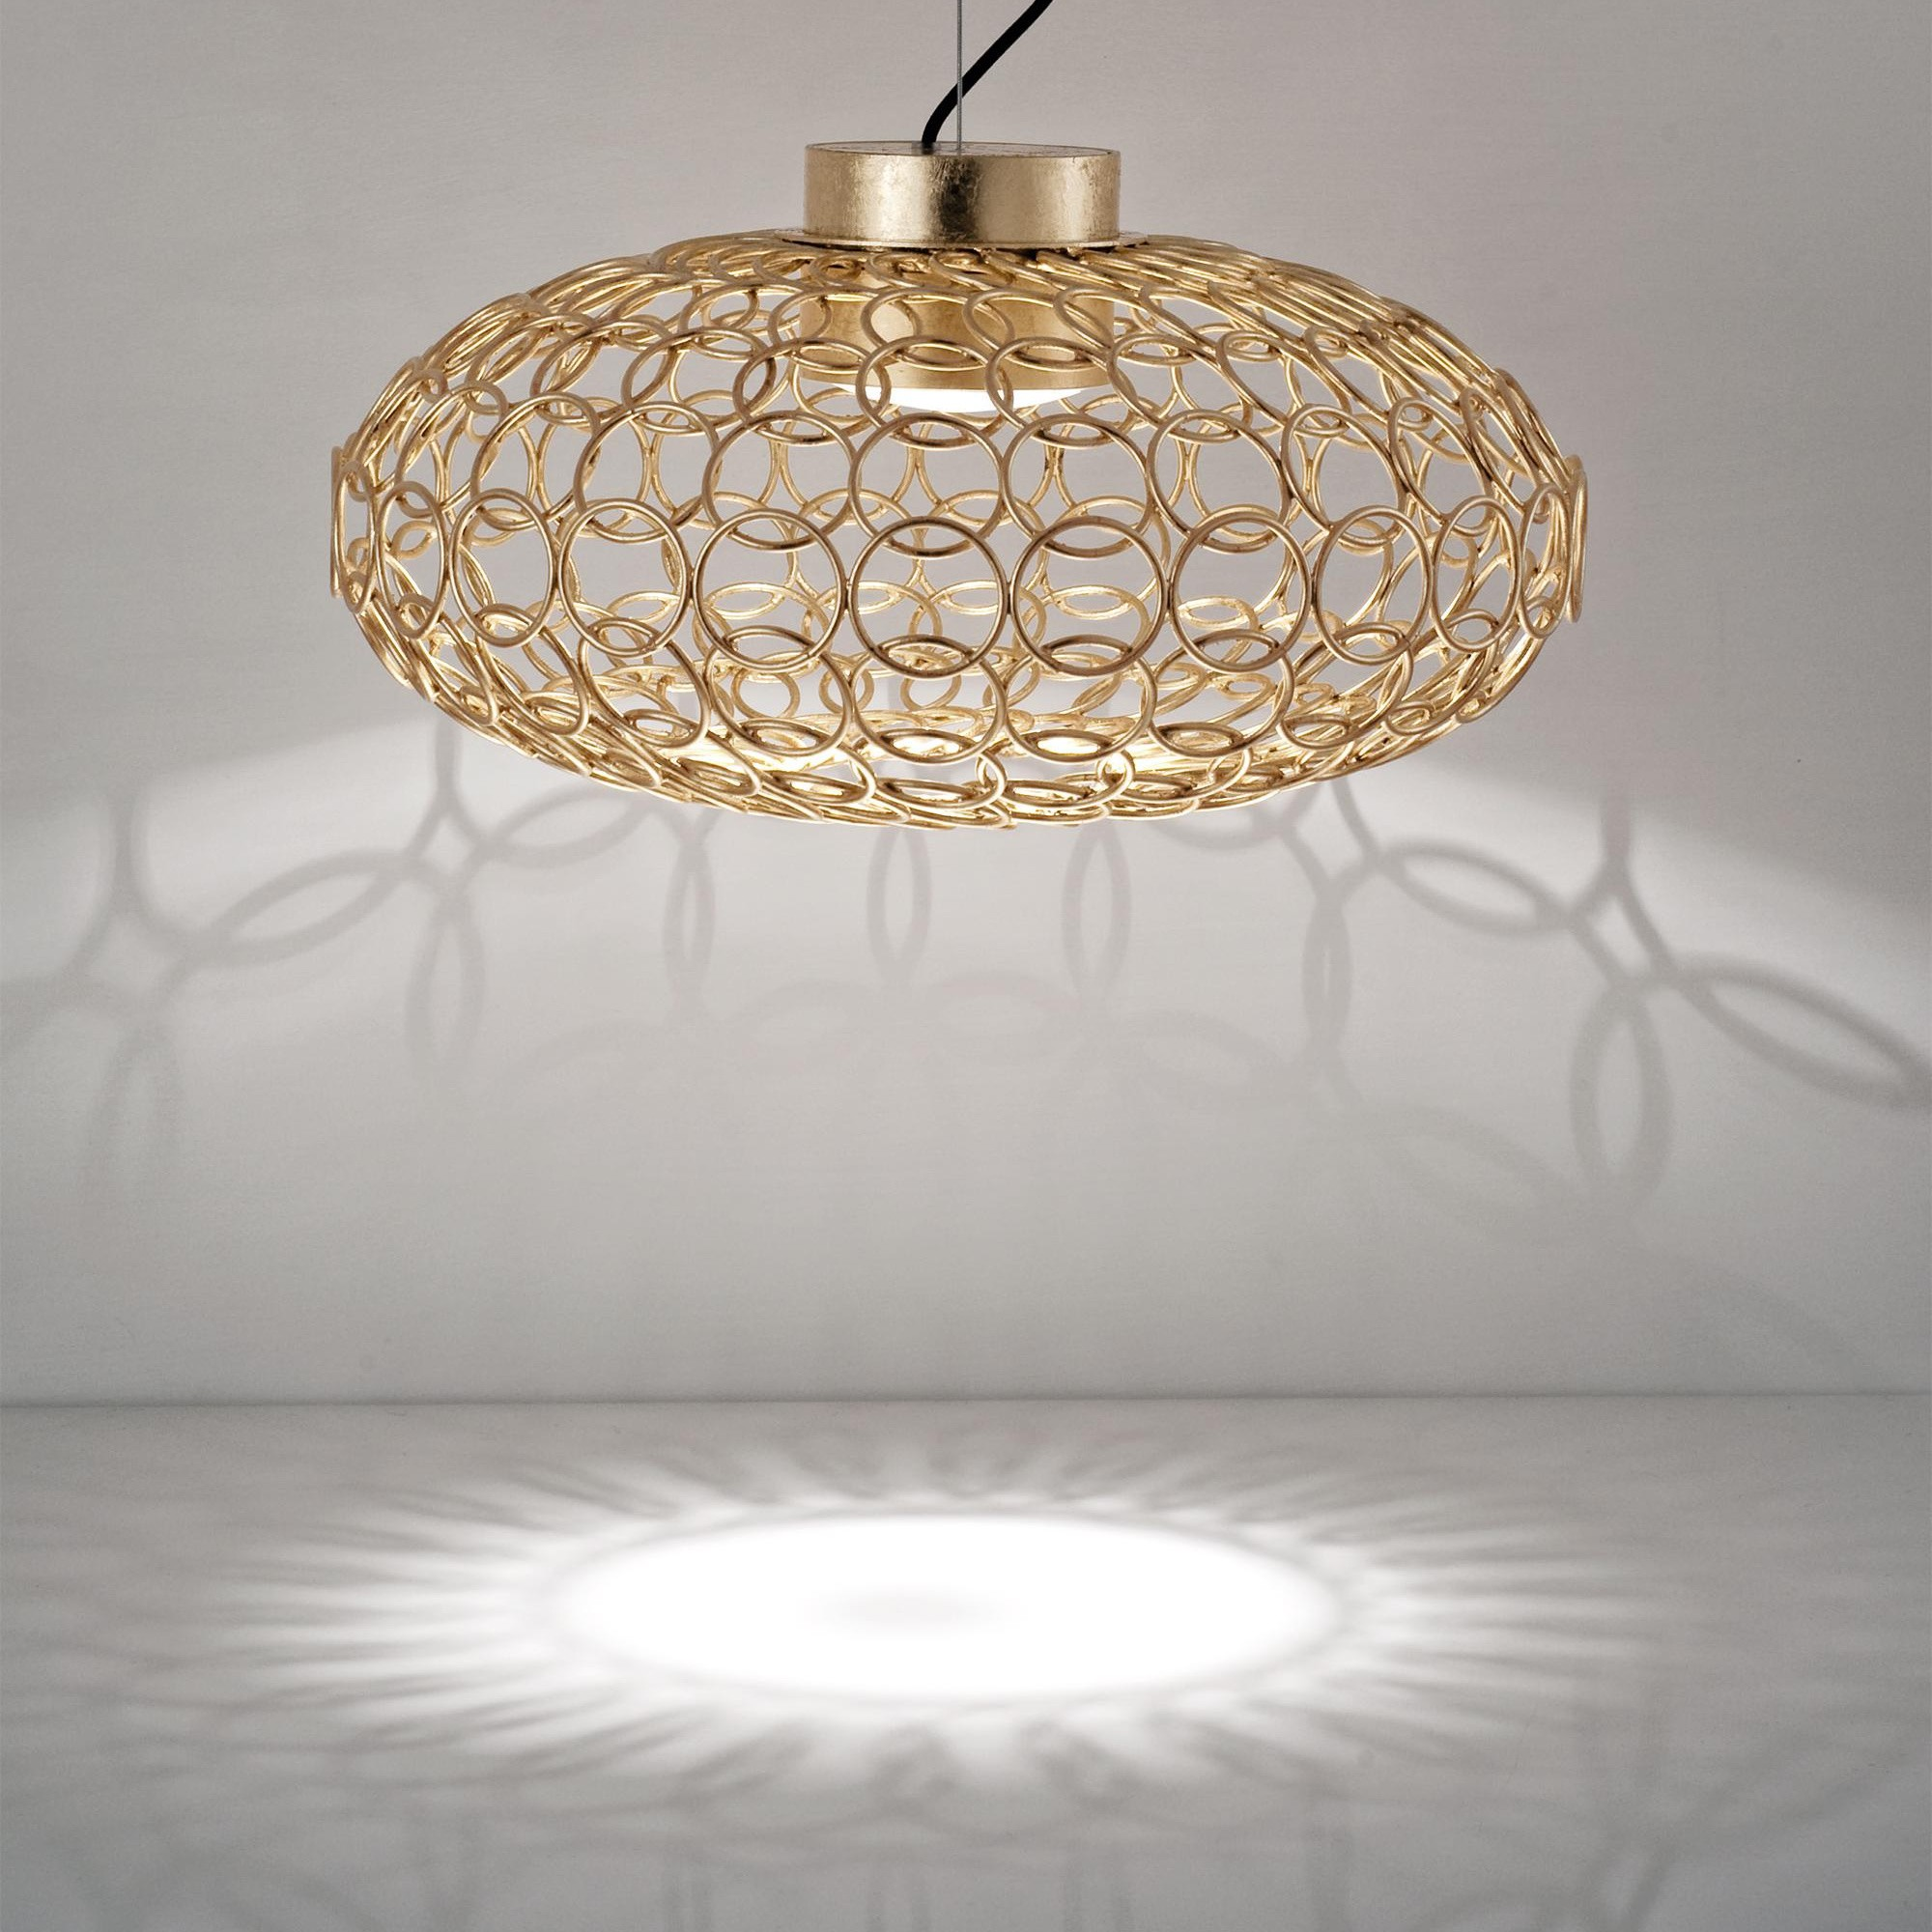 de R LED G Ø50cm A Lámpara suspensión vm8Nn0wO